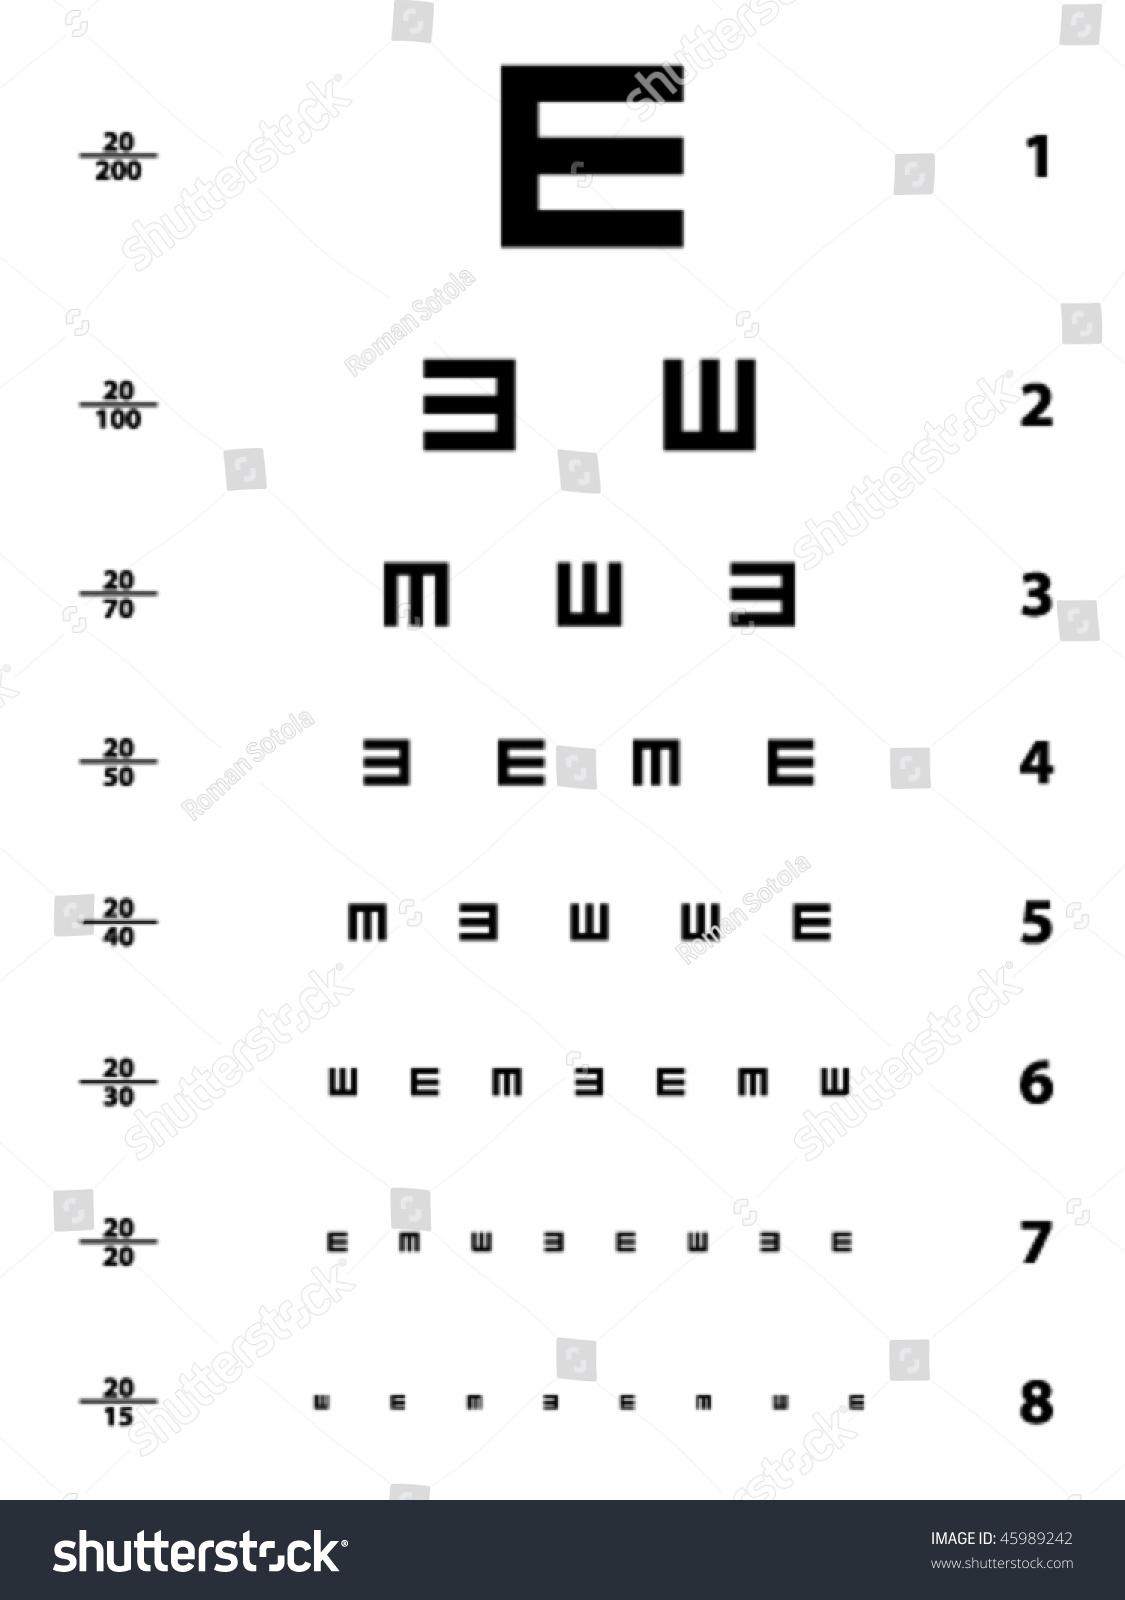 Vector snellen eye test chart stock vector 45989242 shutterstock vector snellen eye test chart nvjuhfo Gallery